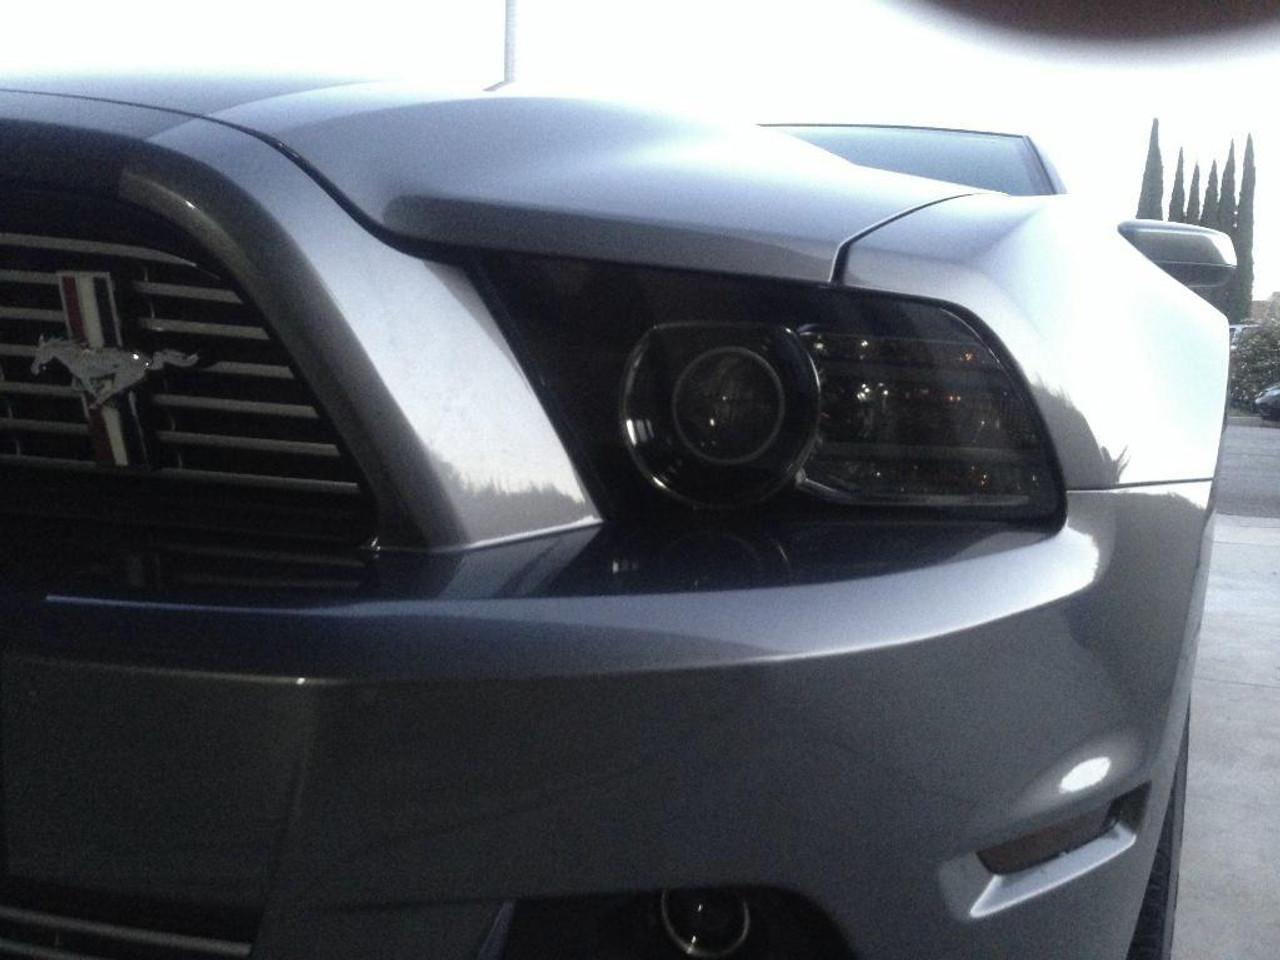 medium resolution of  smoked headlight covers 2010 2014 mustang